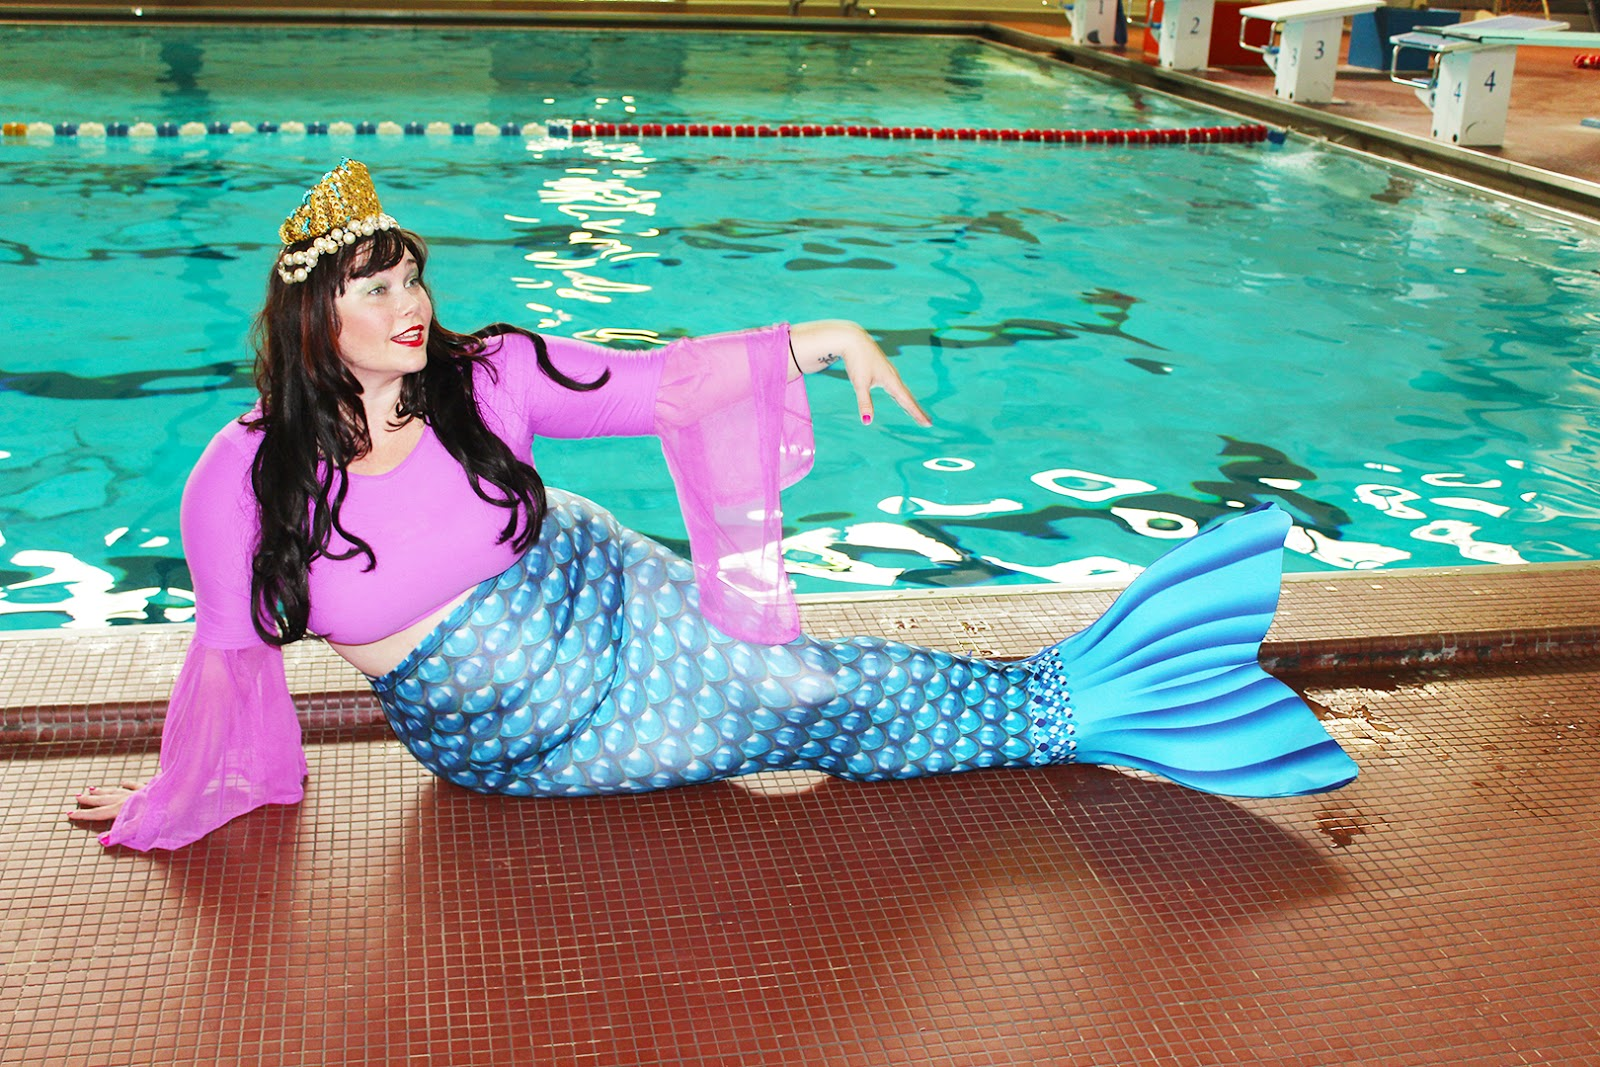 Mermaid, mermaid classes, mermaid Chicago, Plus Size blogger, Style Plus Curves